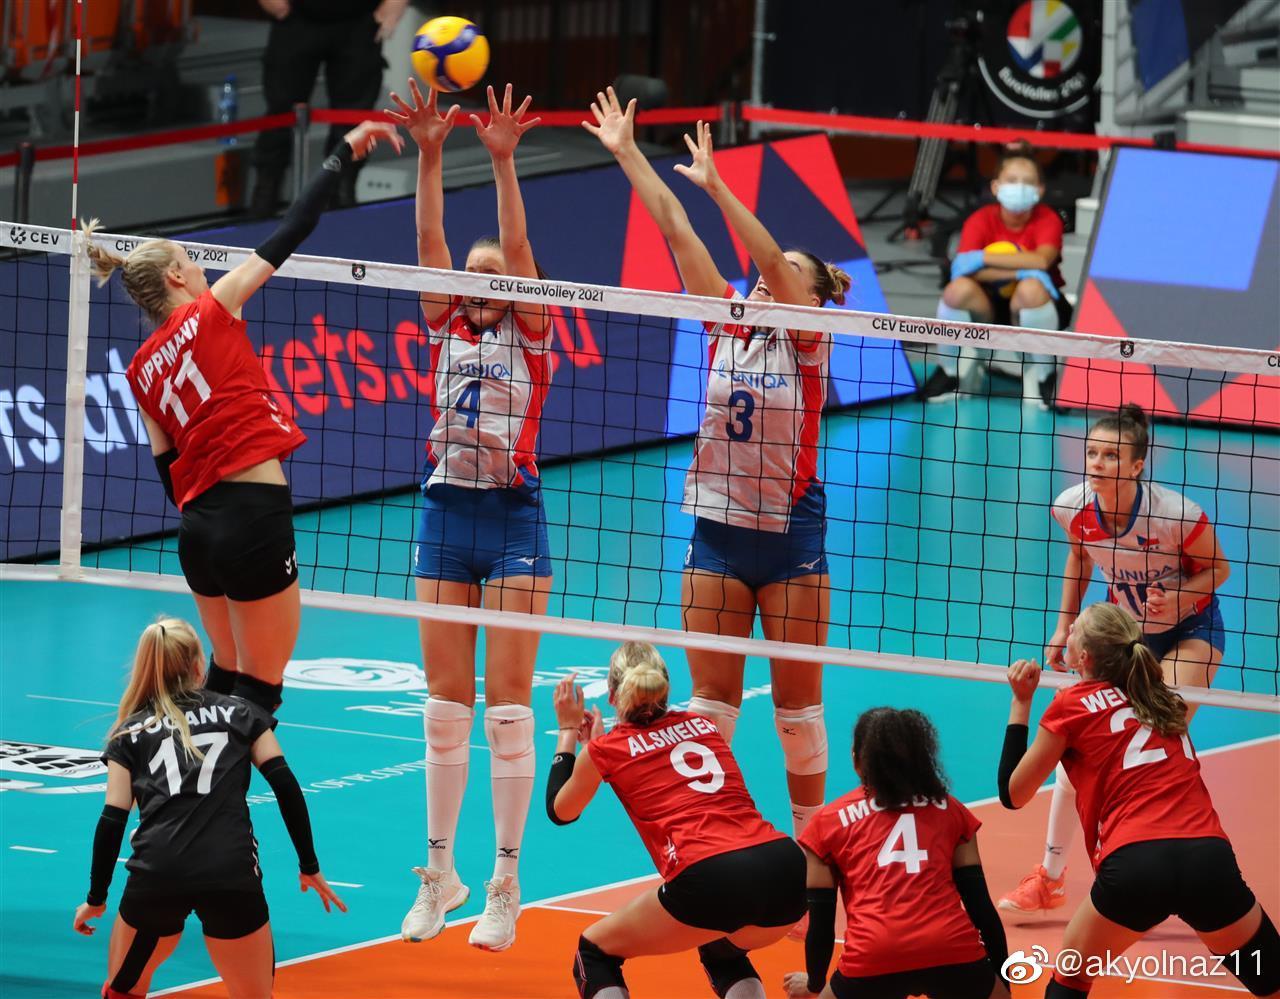 2021年女排欧锦赛B组,<a href=